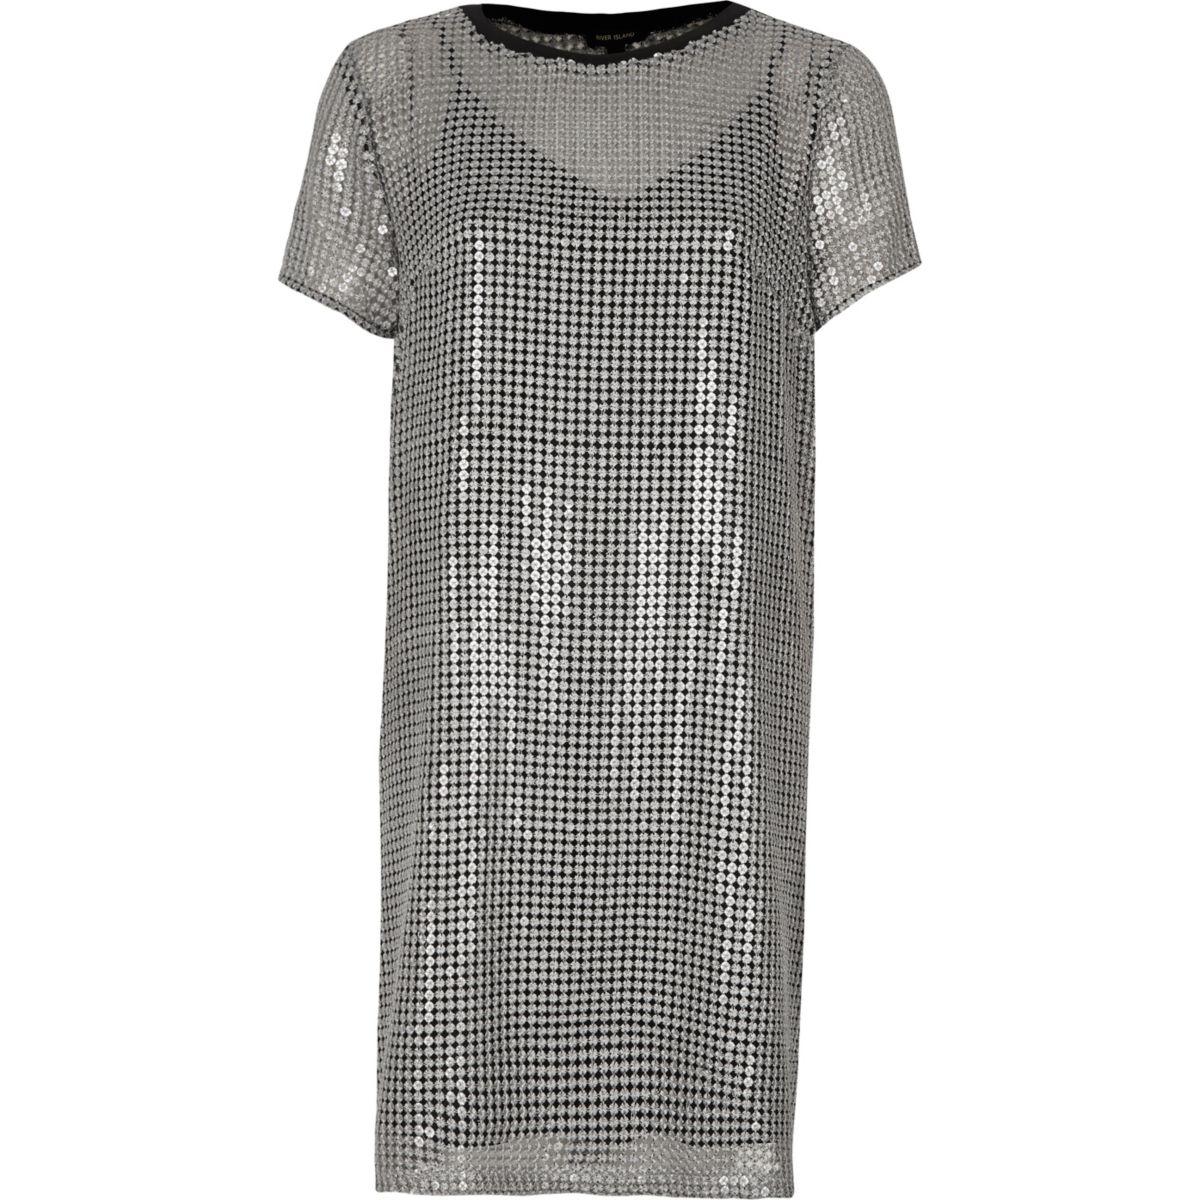 Silver sequin t shirt dress dresses sale women for Sequin t shirt changing